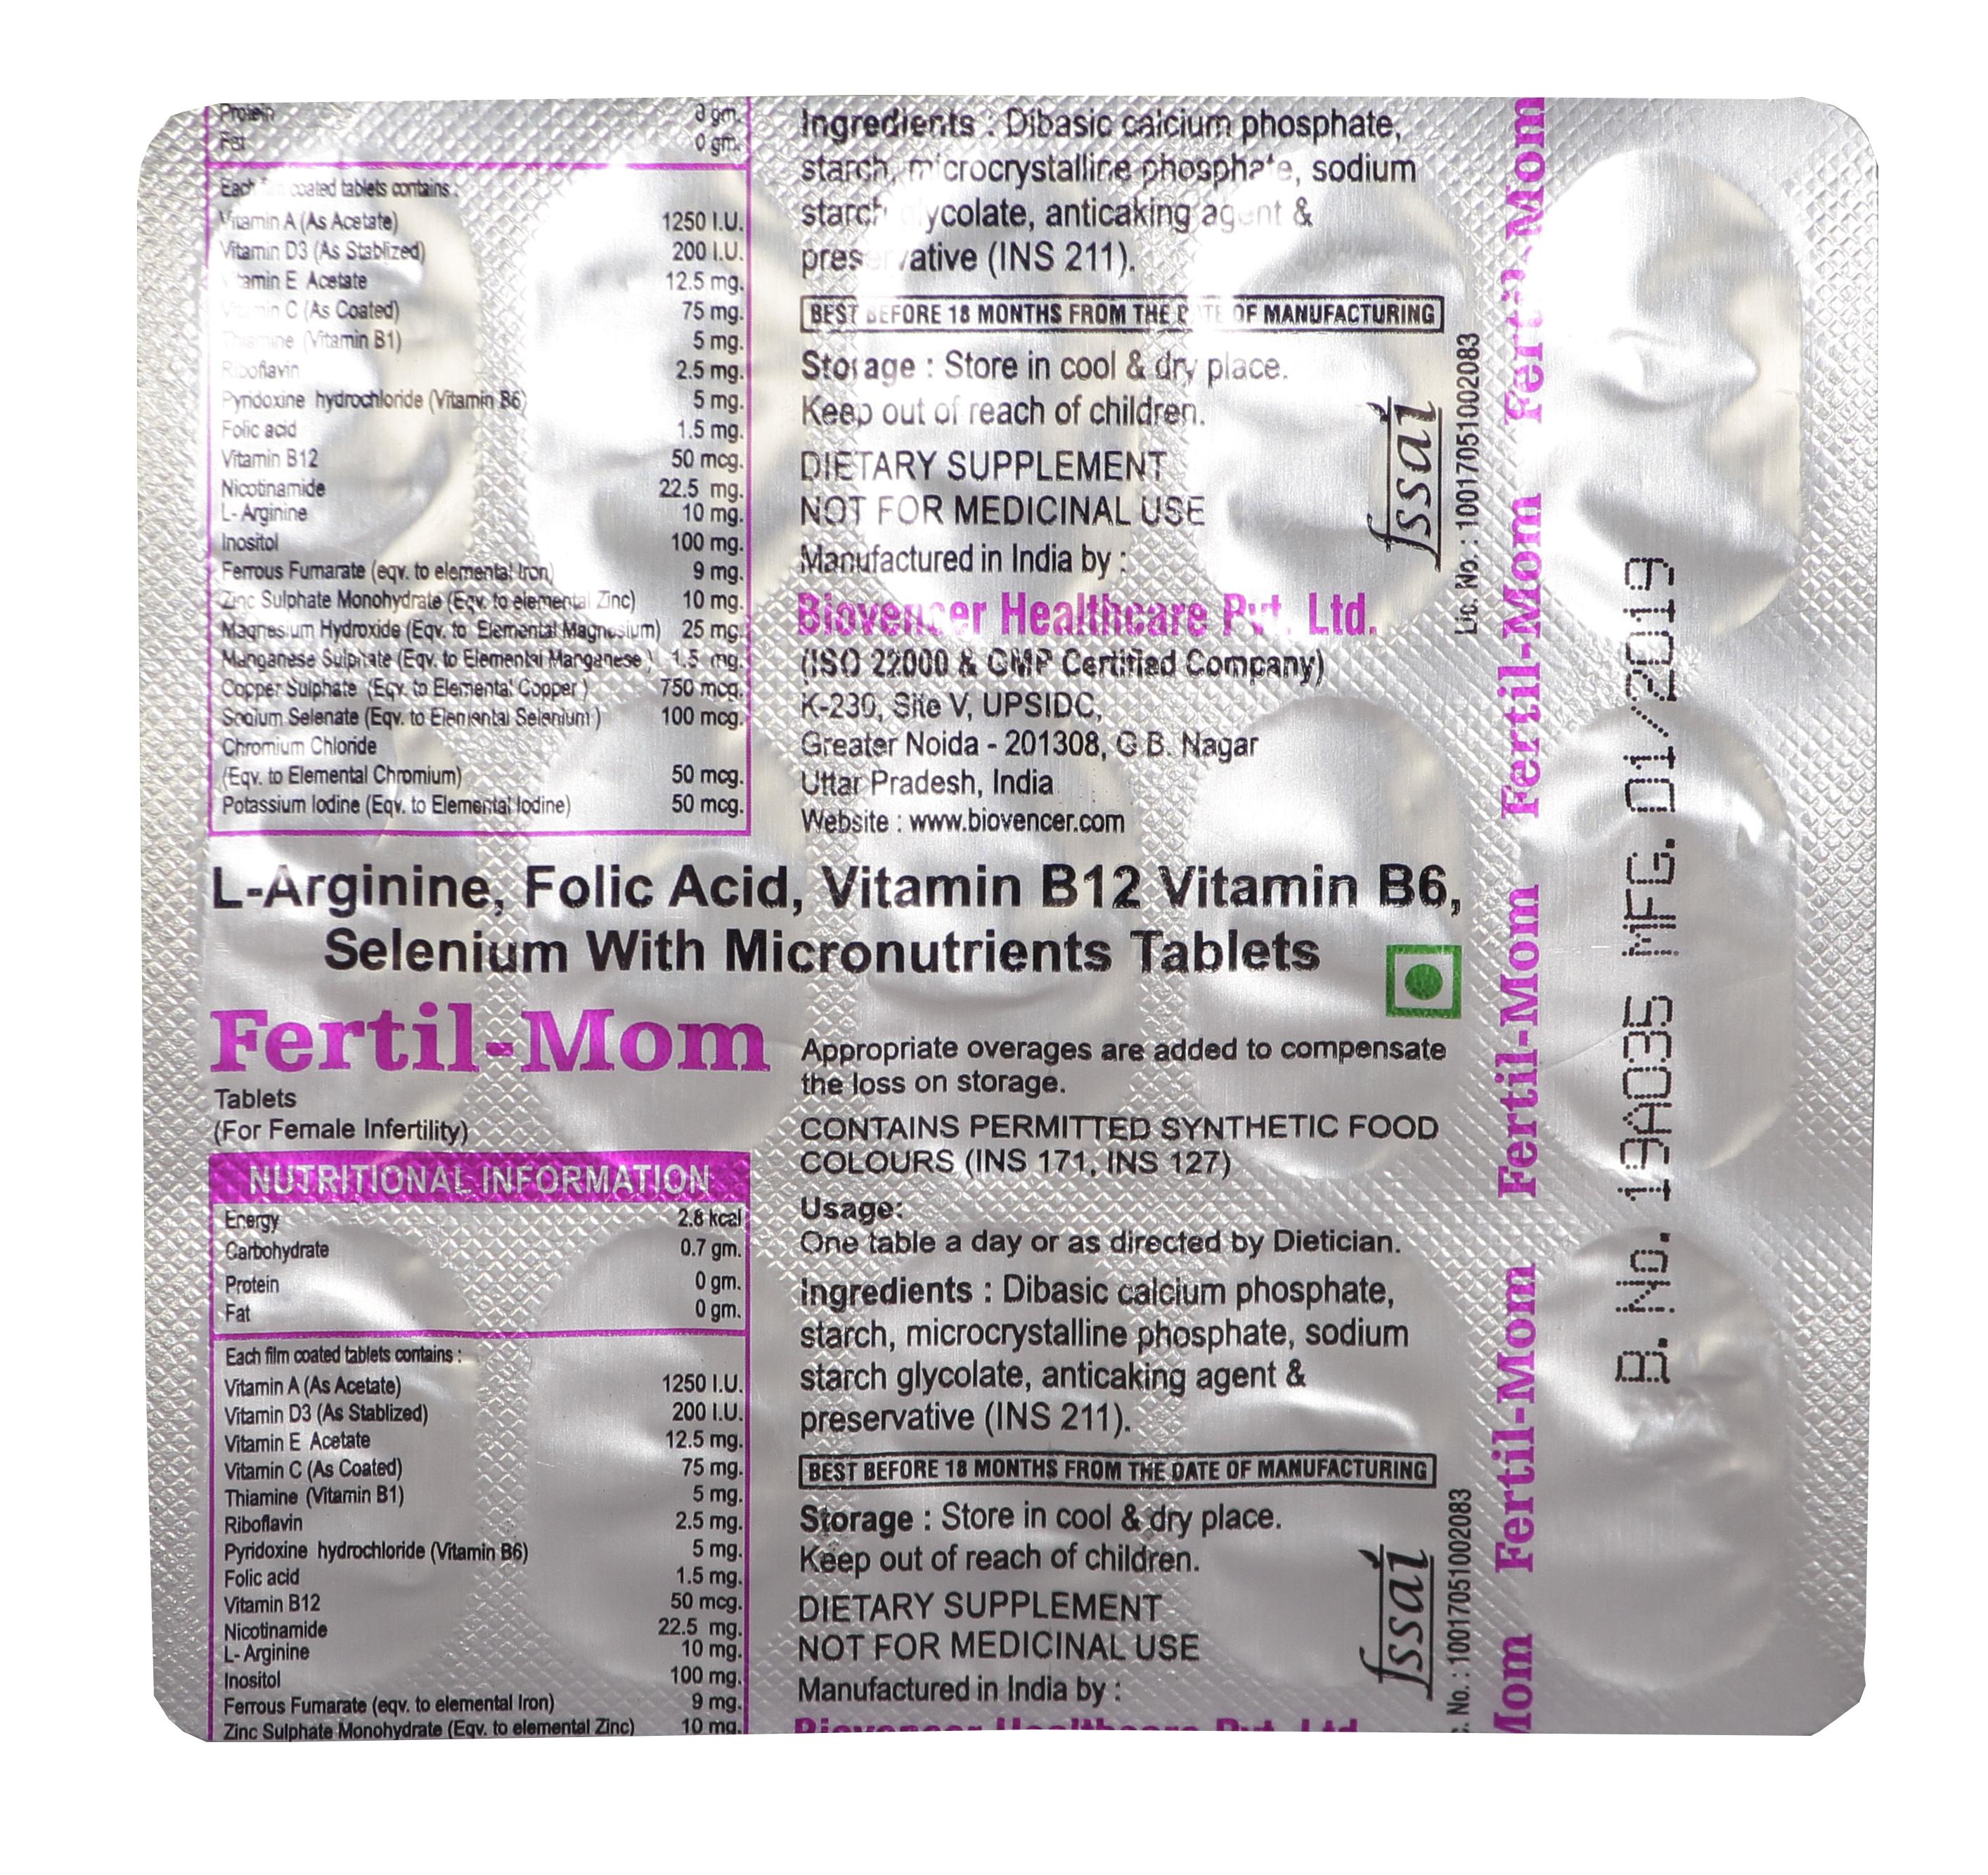 L-Arginine, Folic Acid, Vitamin B12, Vitamin B6, Selenium with Micronutrients tablets